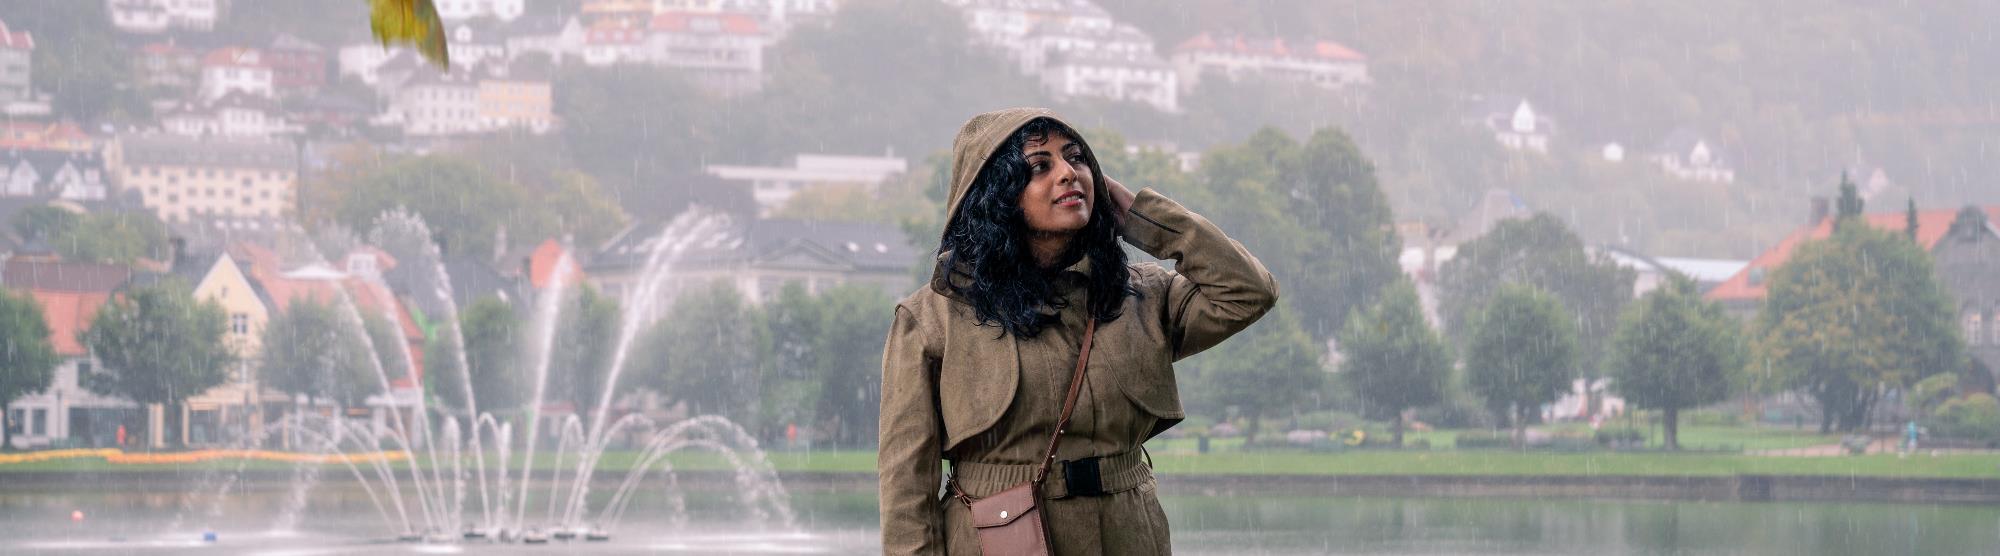 Things to do in Bergen when it is raining